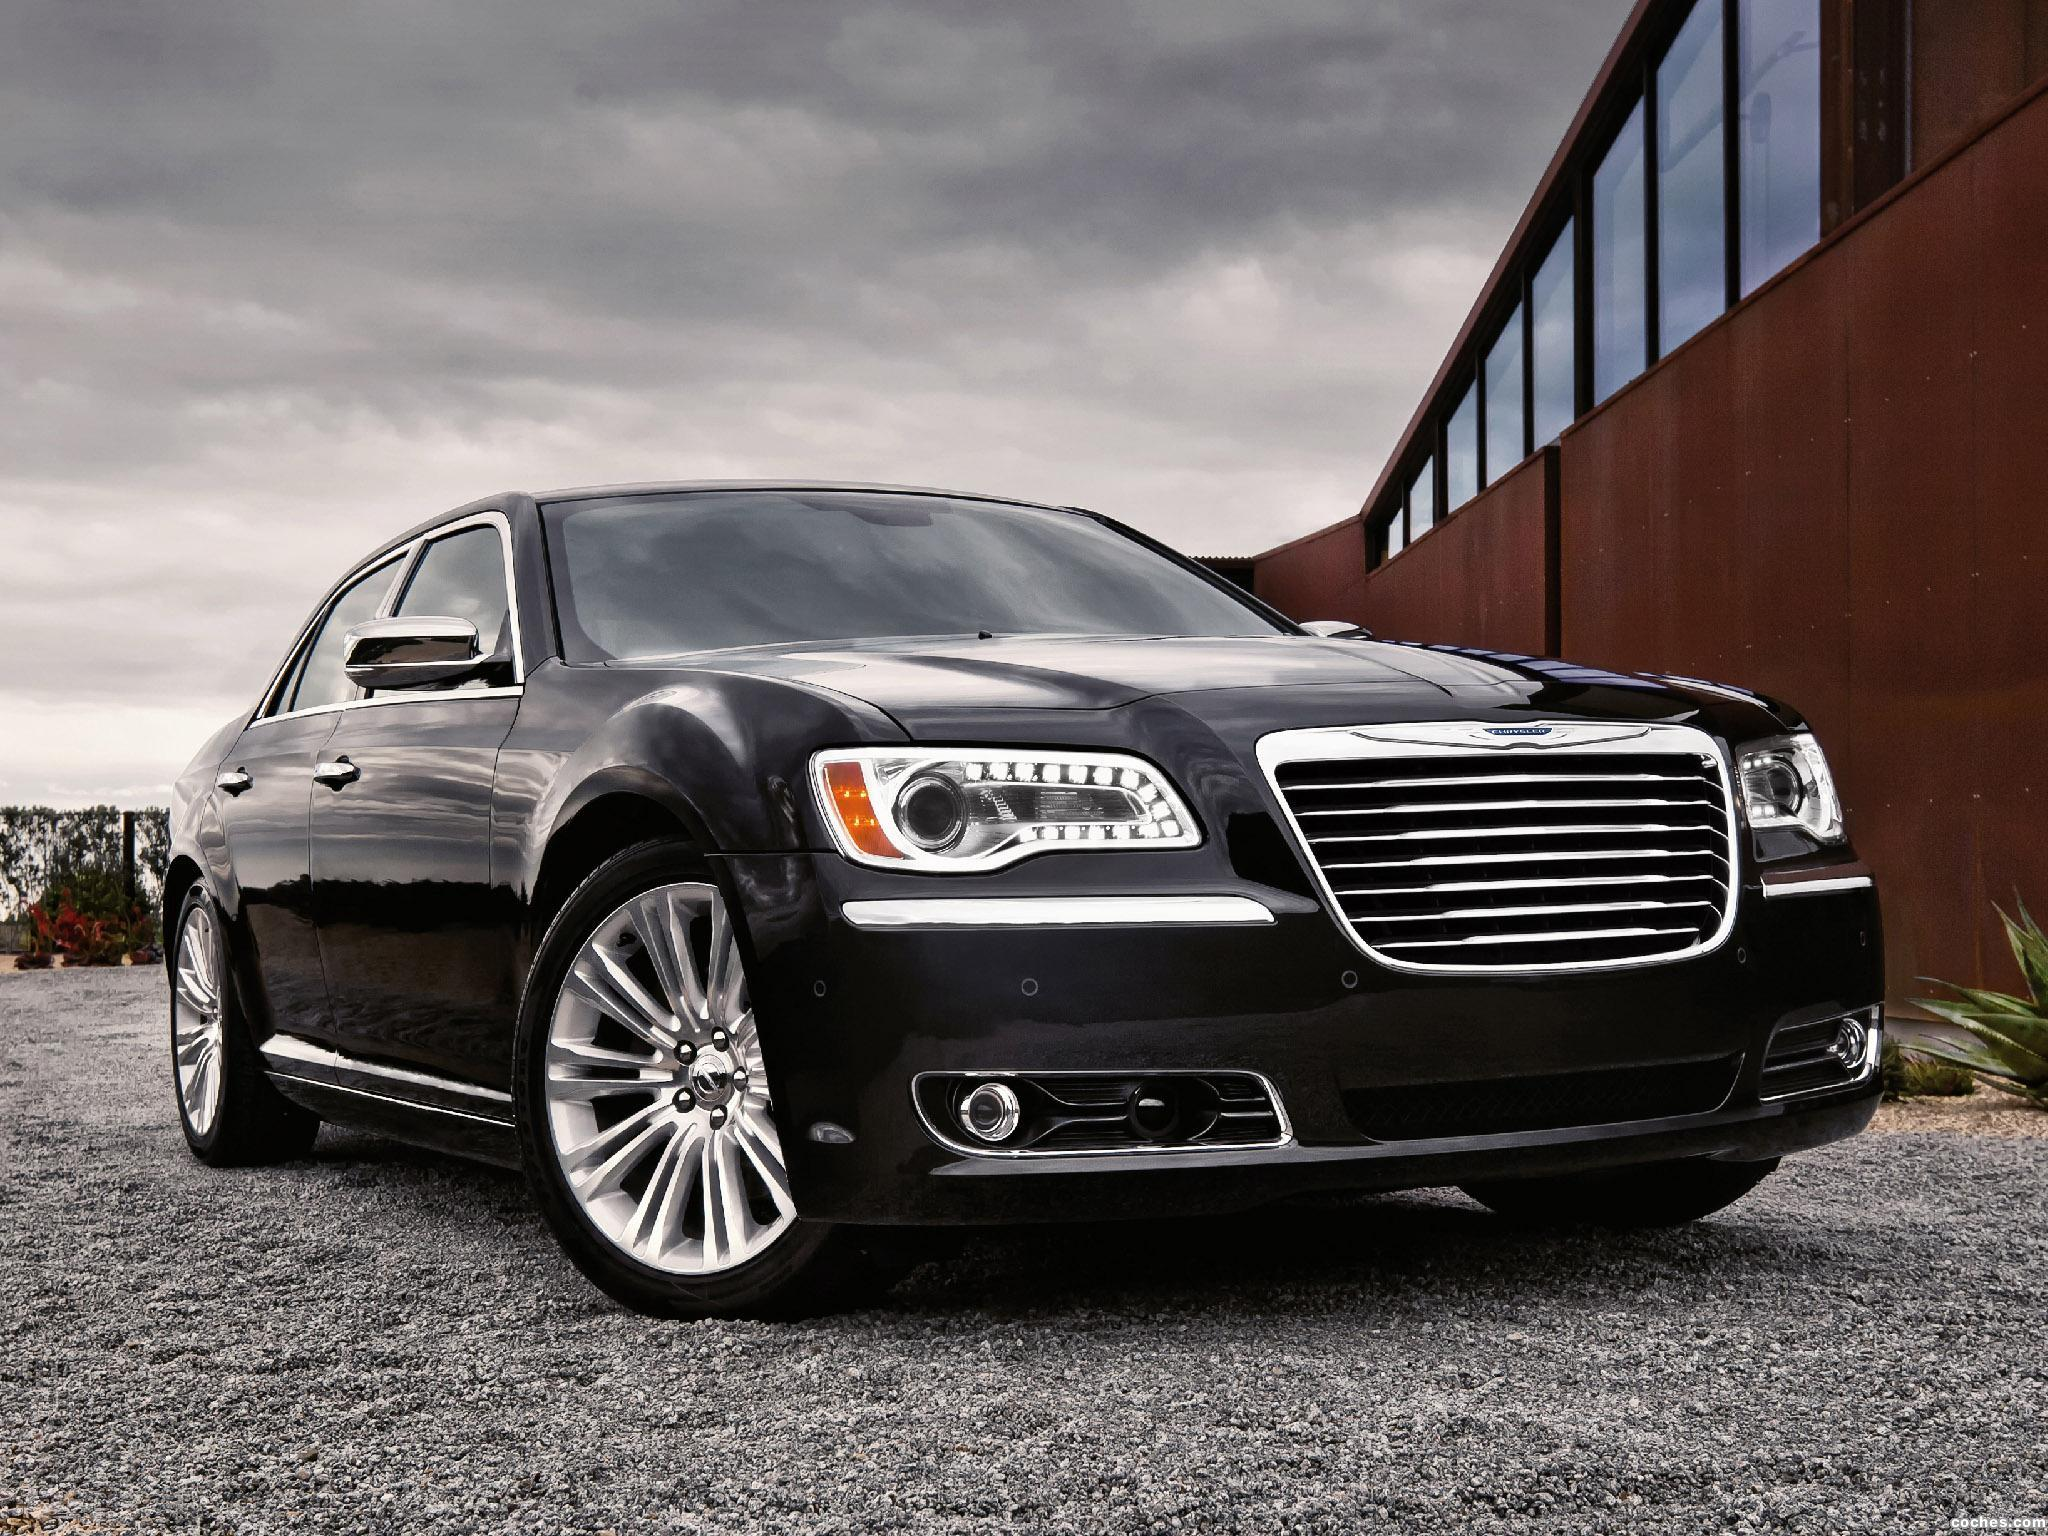 Foto 0 de Chrysler 300 2011